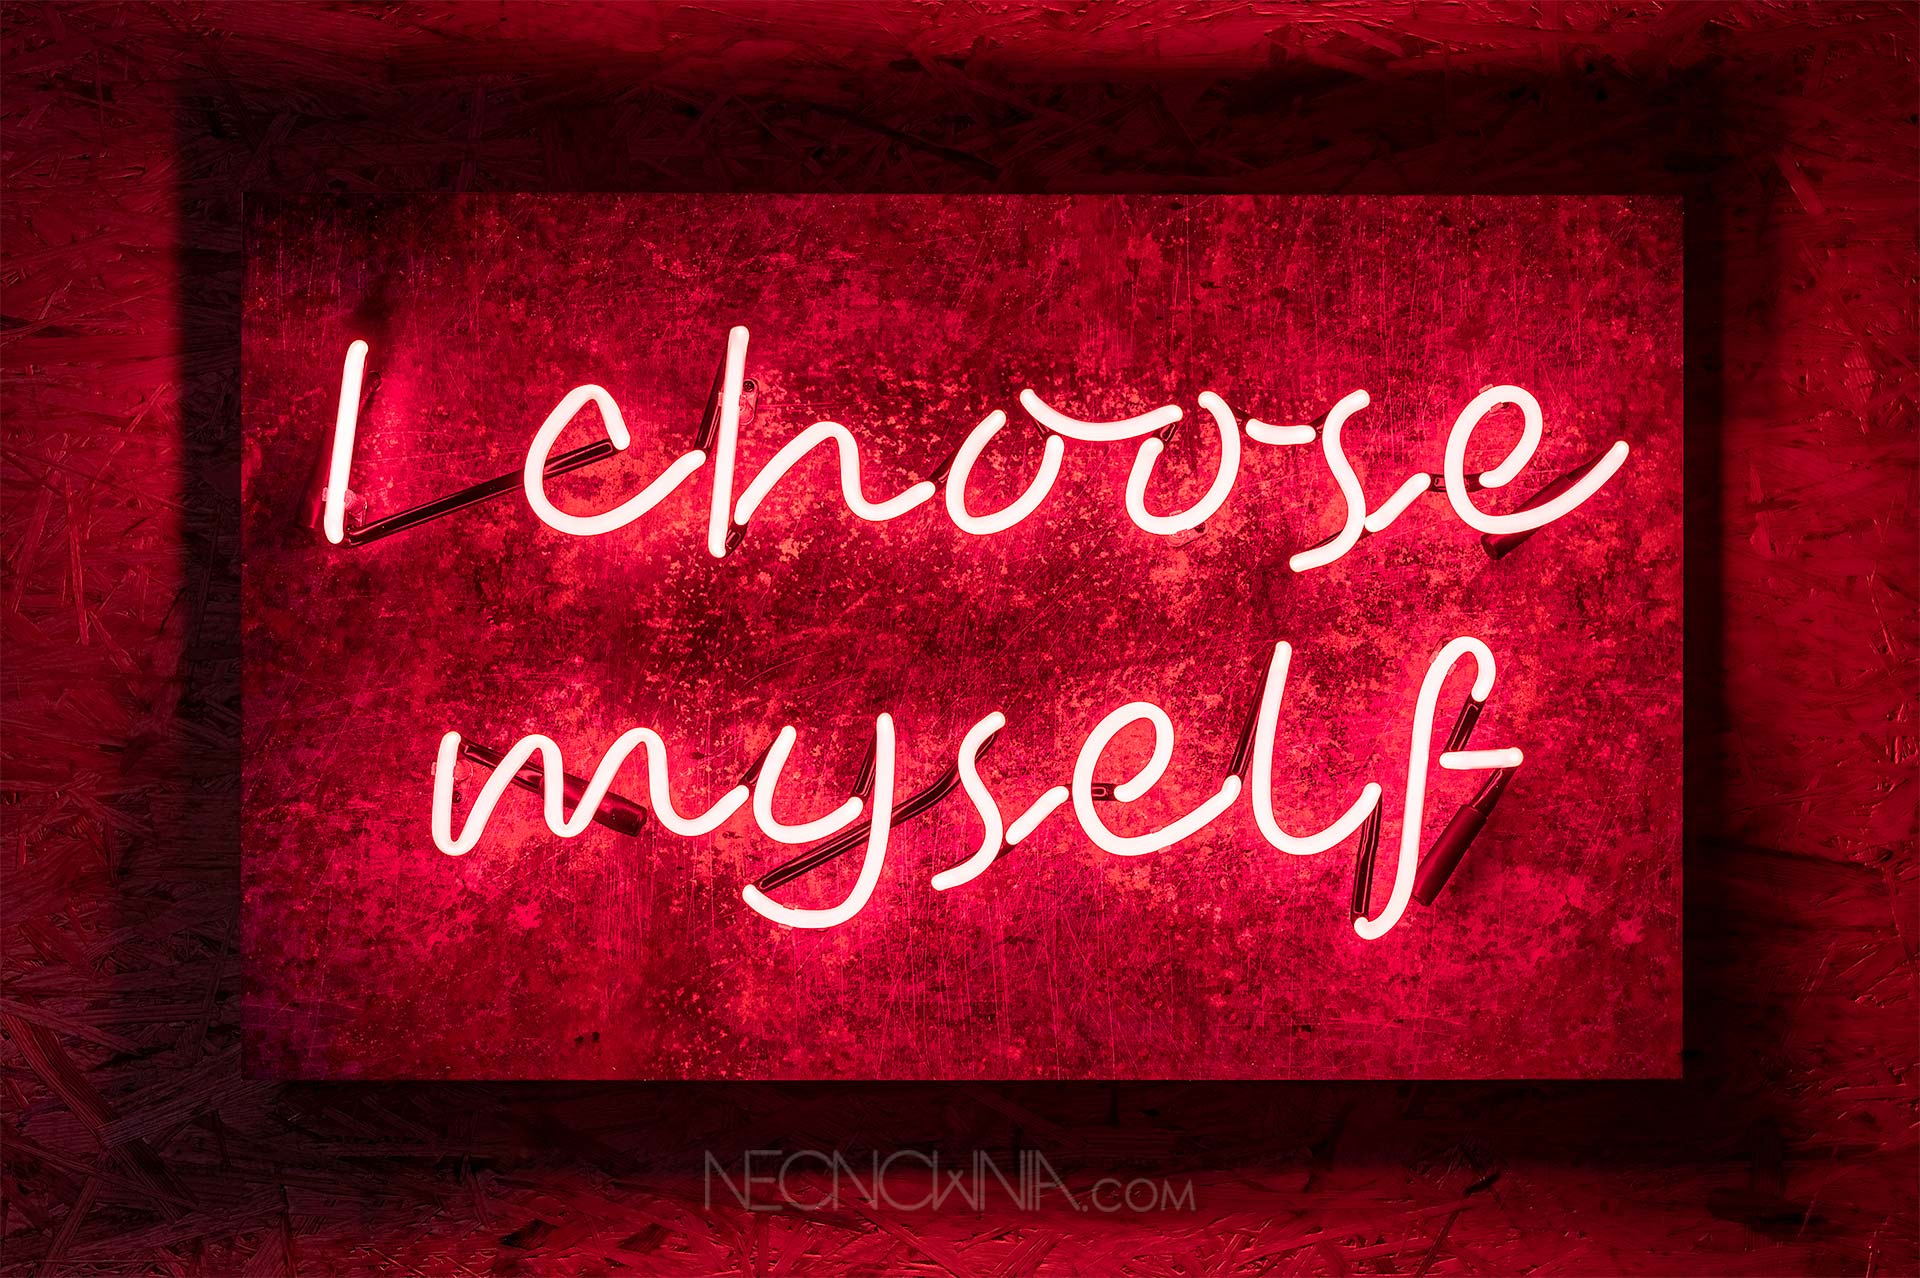 I CHOOSE MYSELF